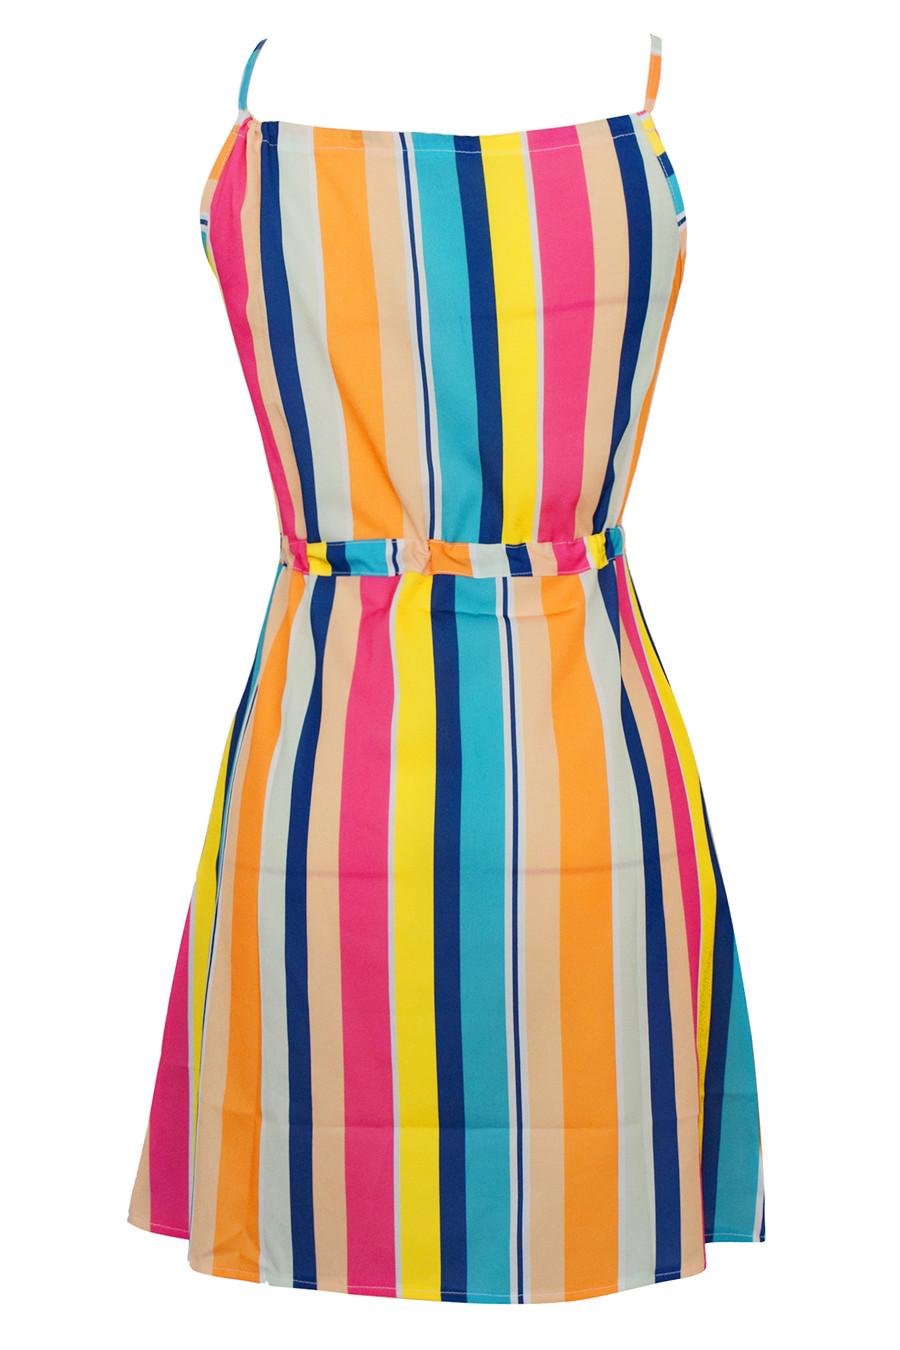 Gladiolus Chiffon Women Summer Dress Spaghetti Strap Floral Print Pocket Sexy Bohemian Beach Dress 2019 Short Ladies Dresses (28)